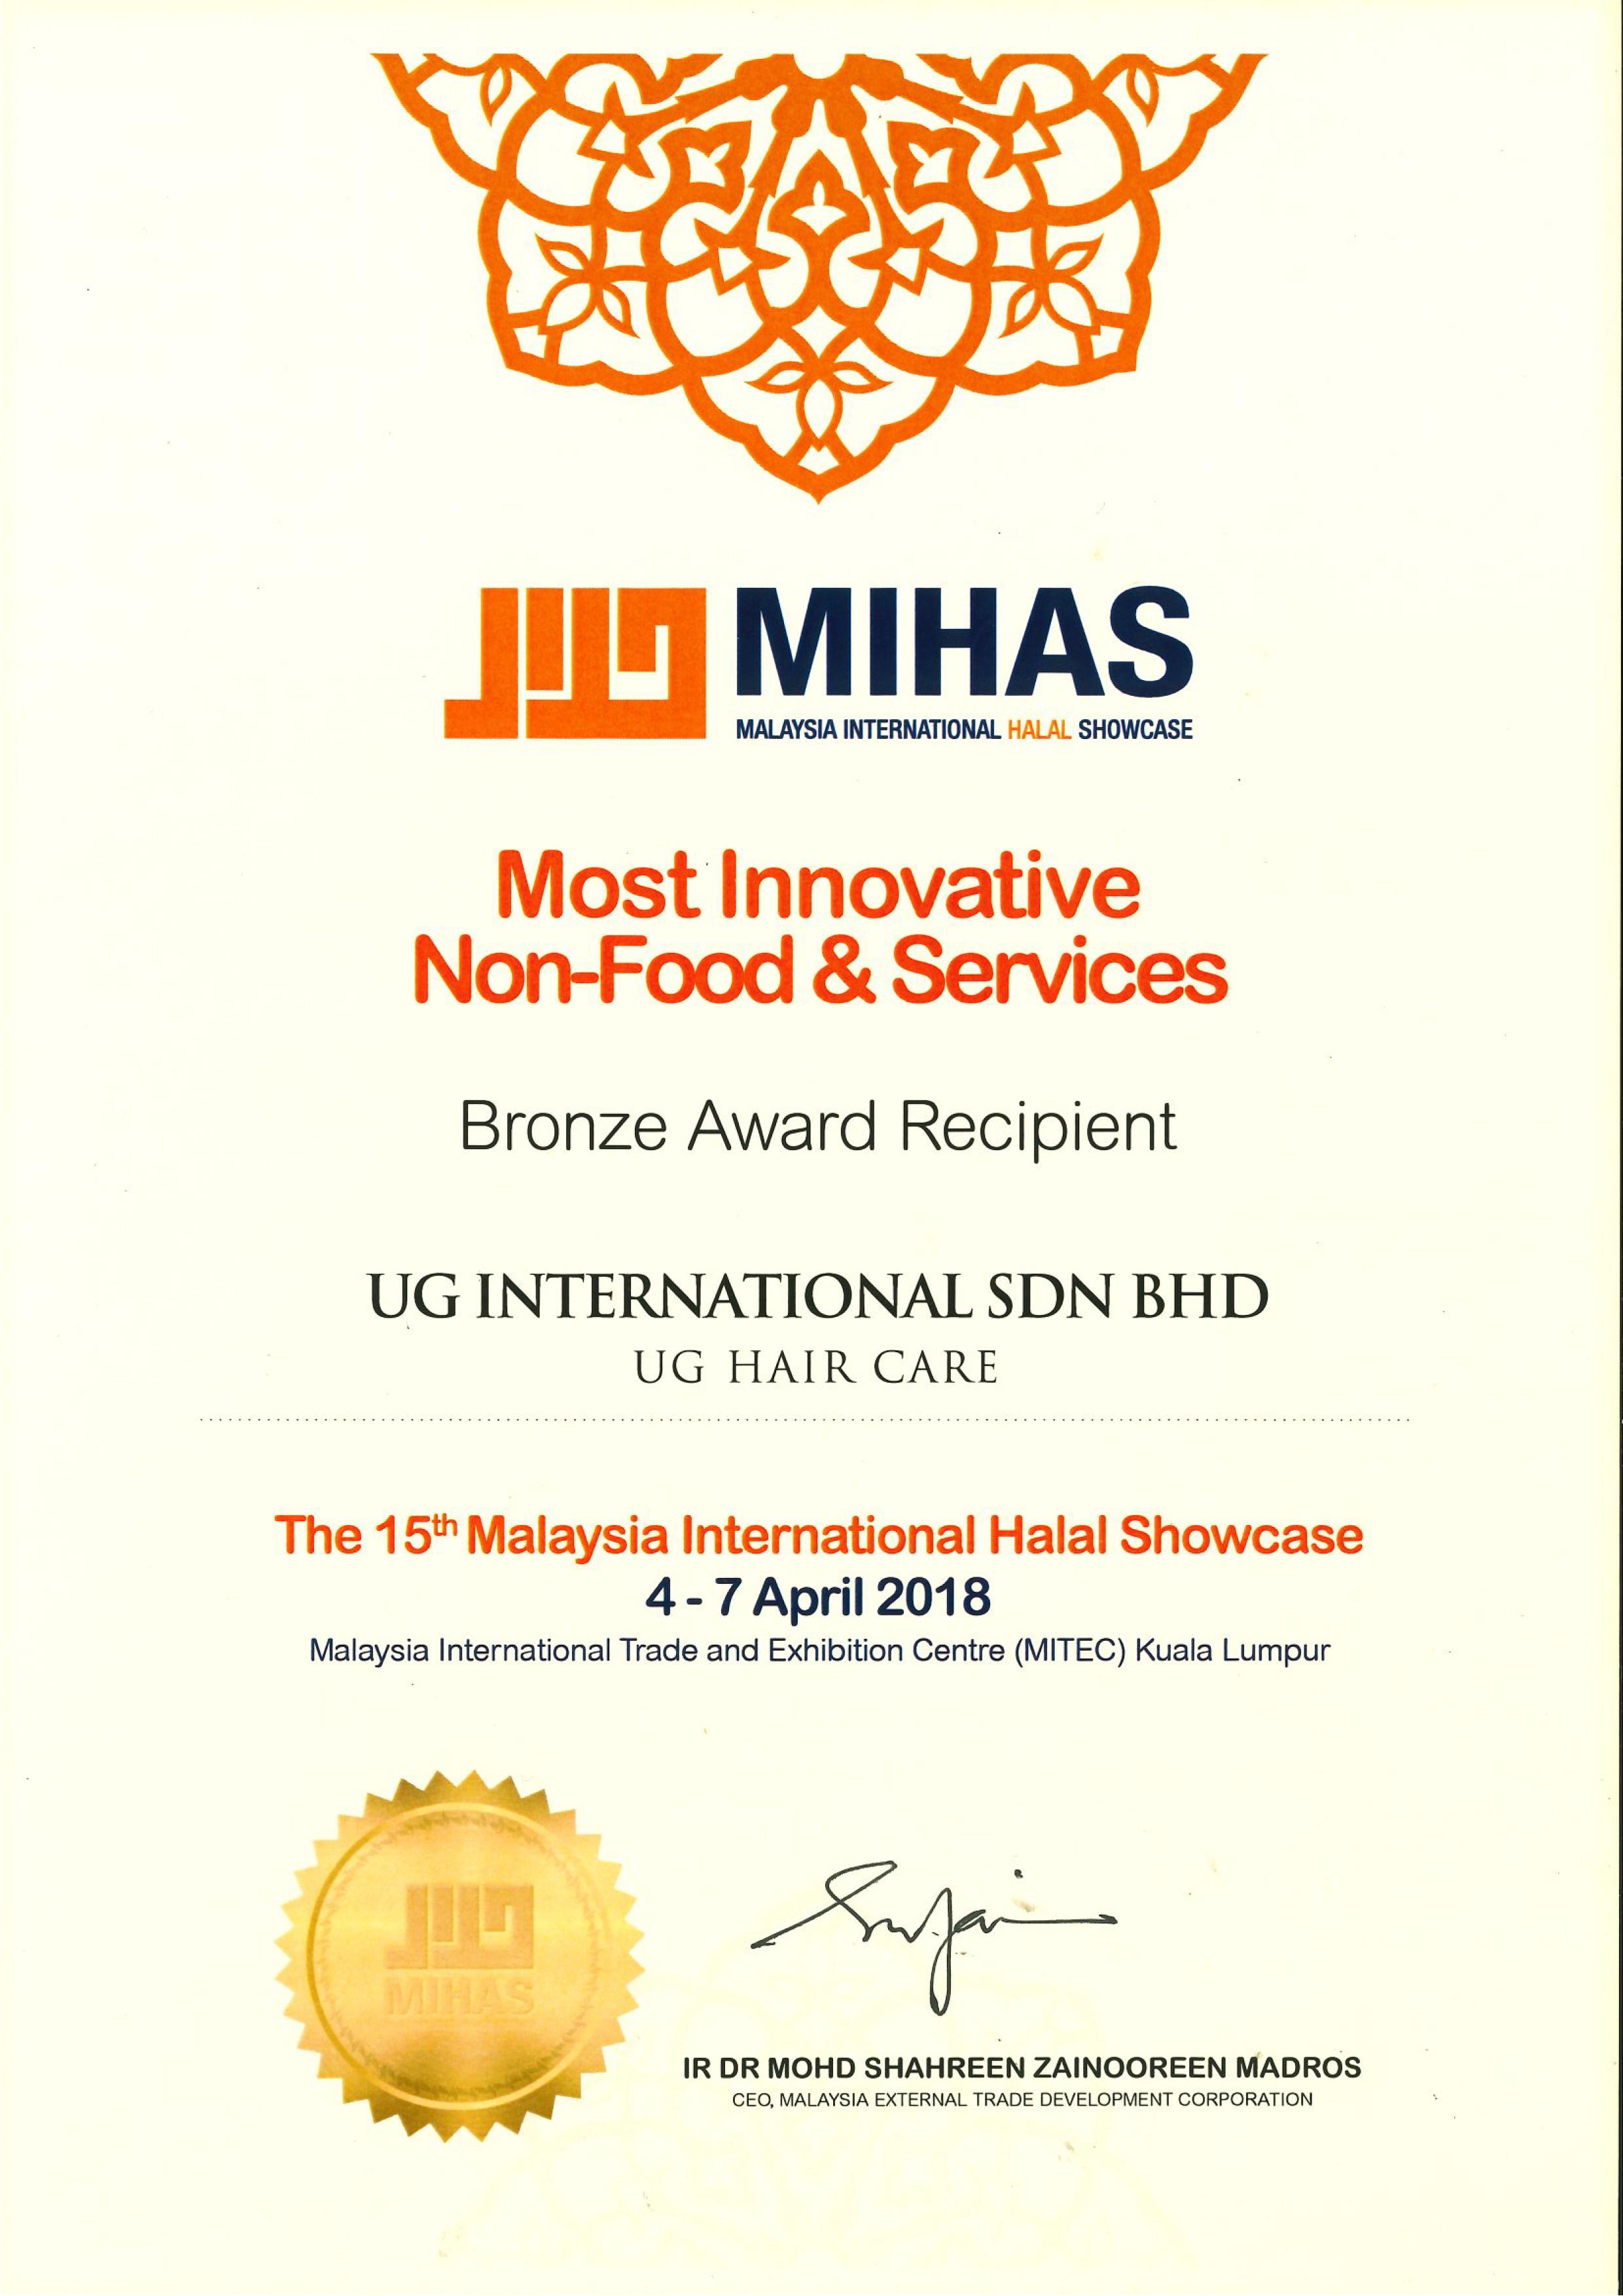 The 15th Malaysia International Halal Showcase (MIHAS Award)